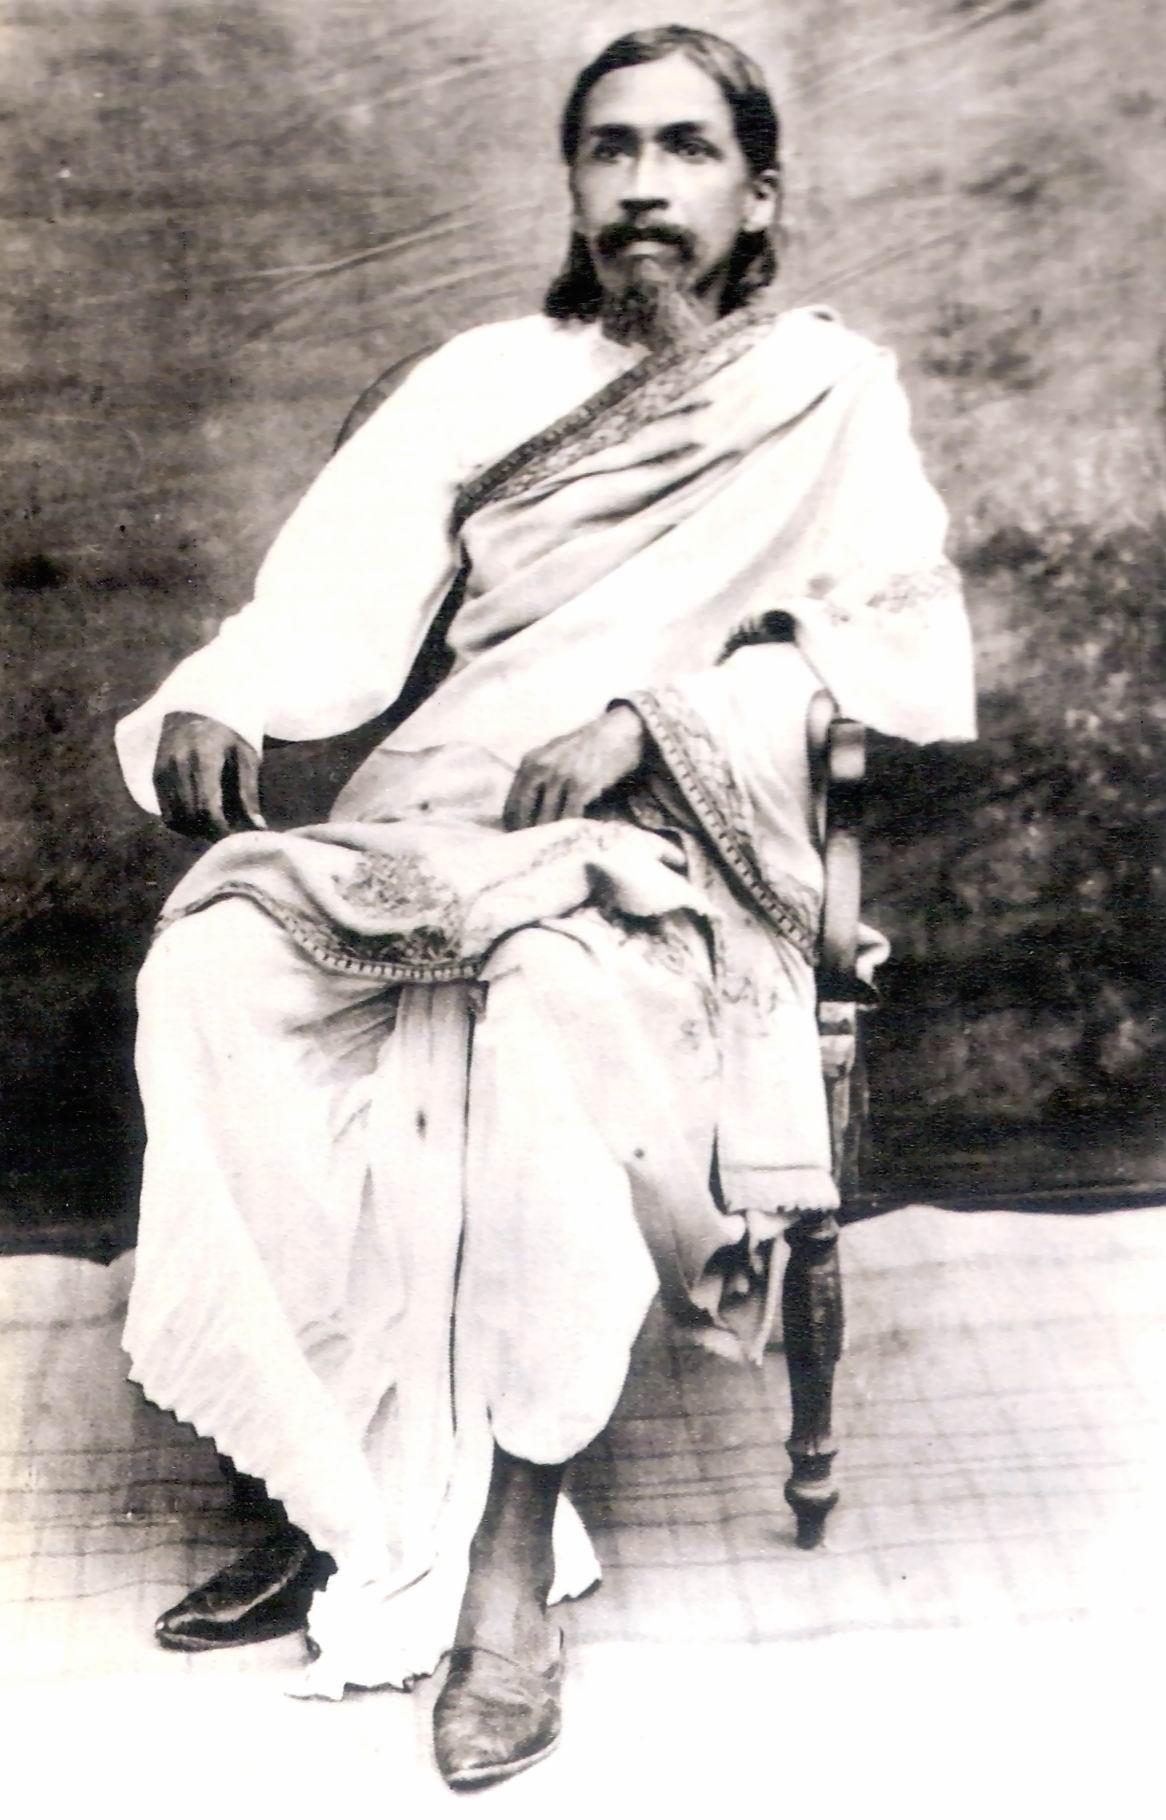 Sri Aurobindo Archives - Collected Works of Sri Aurobindo